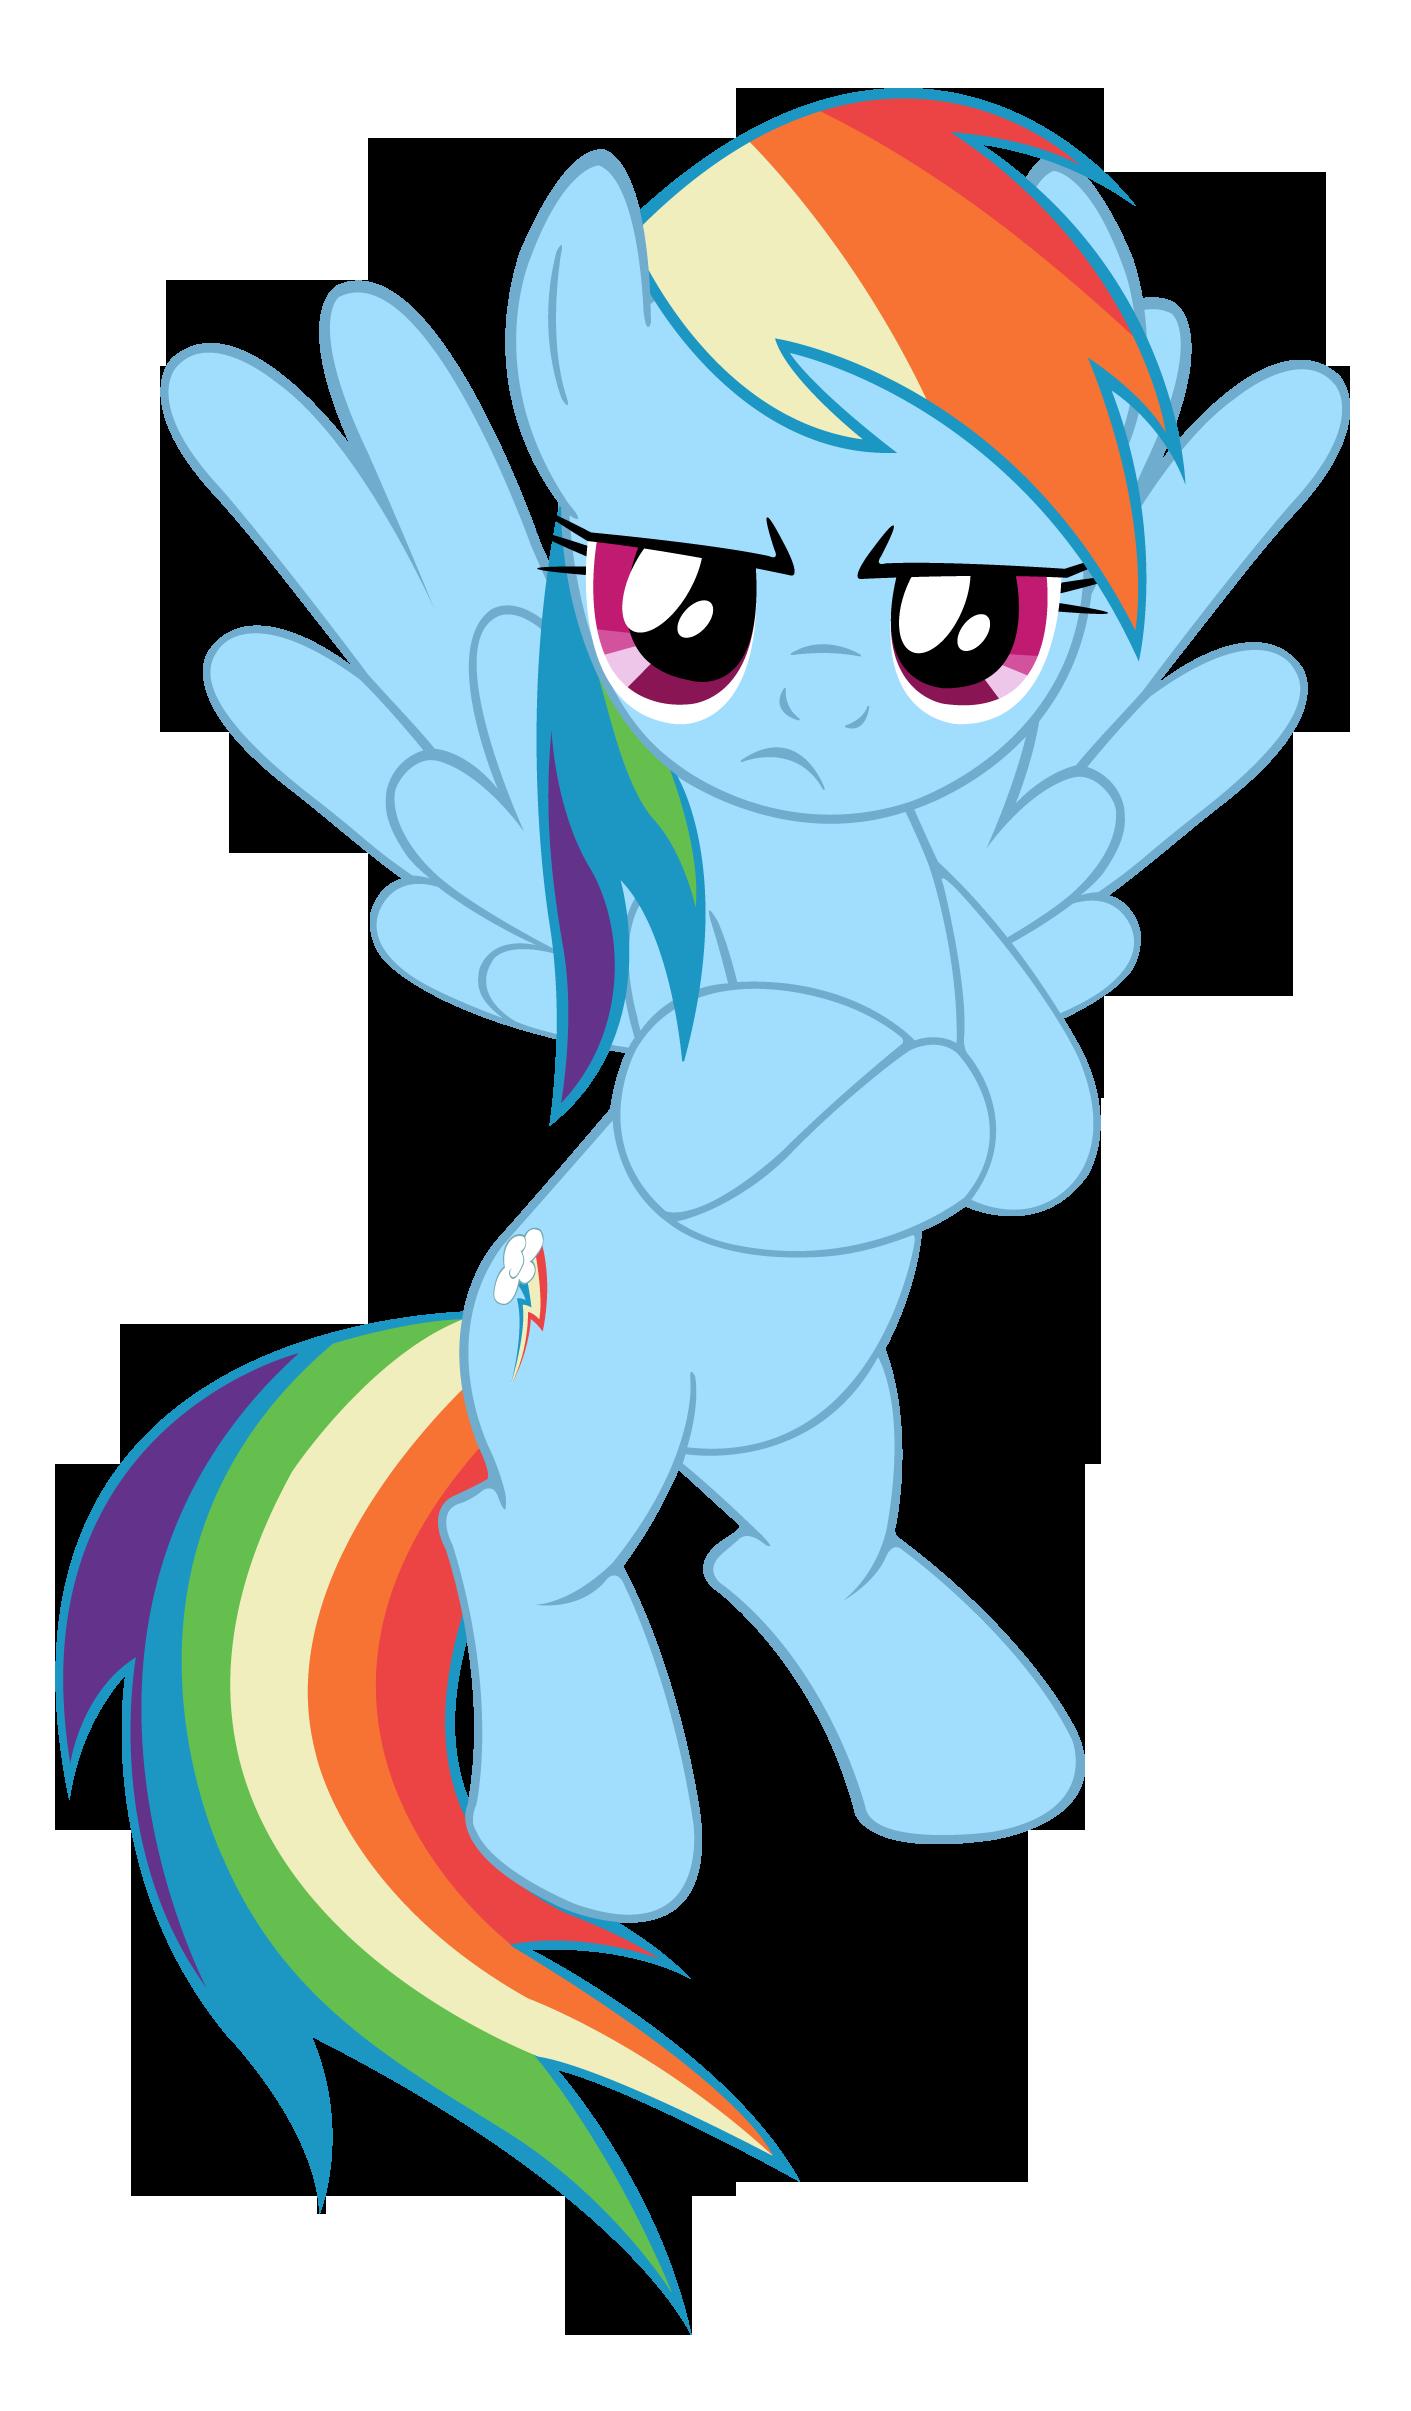 Angry Rainbow Dash by MasterRottweiler